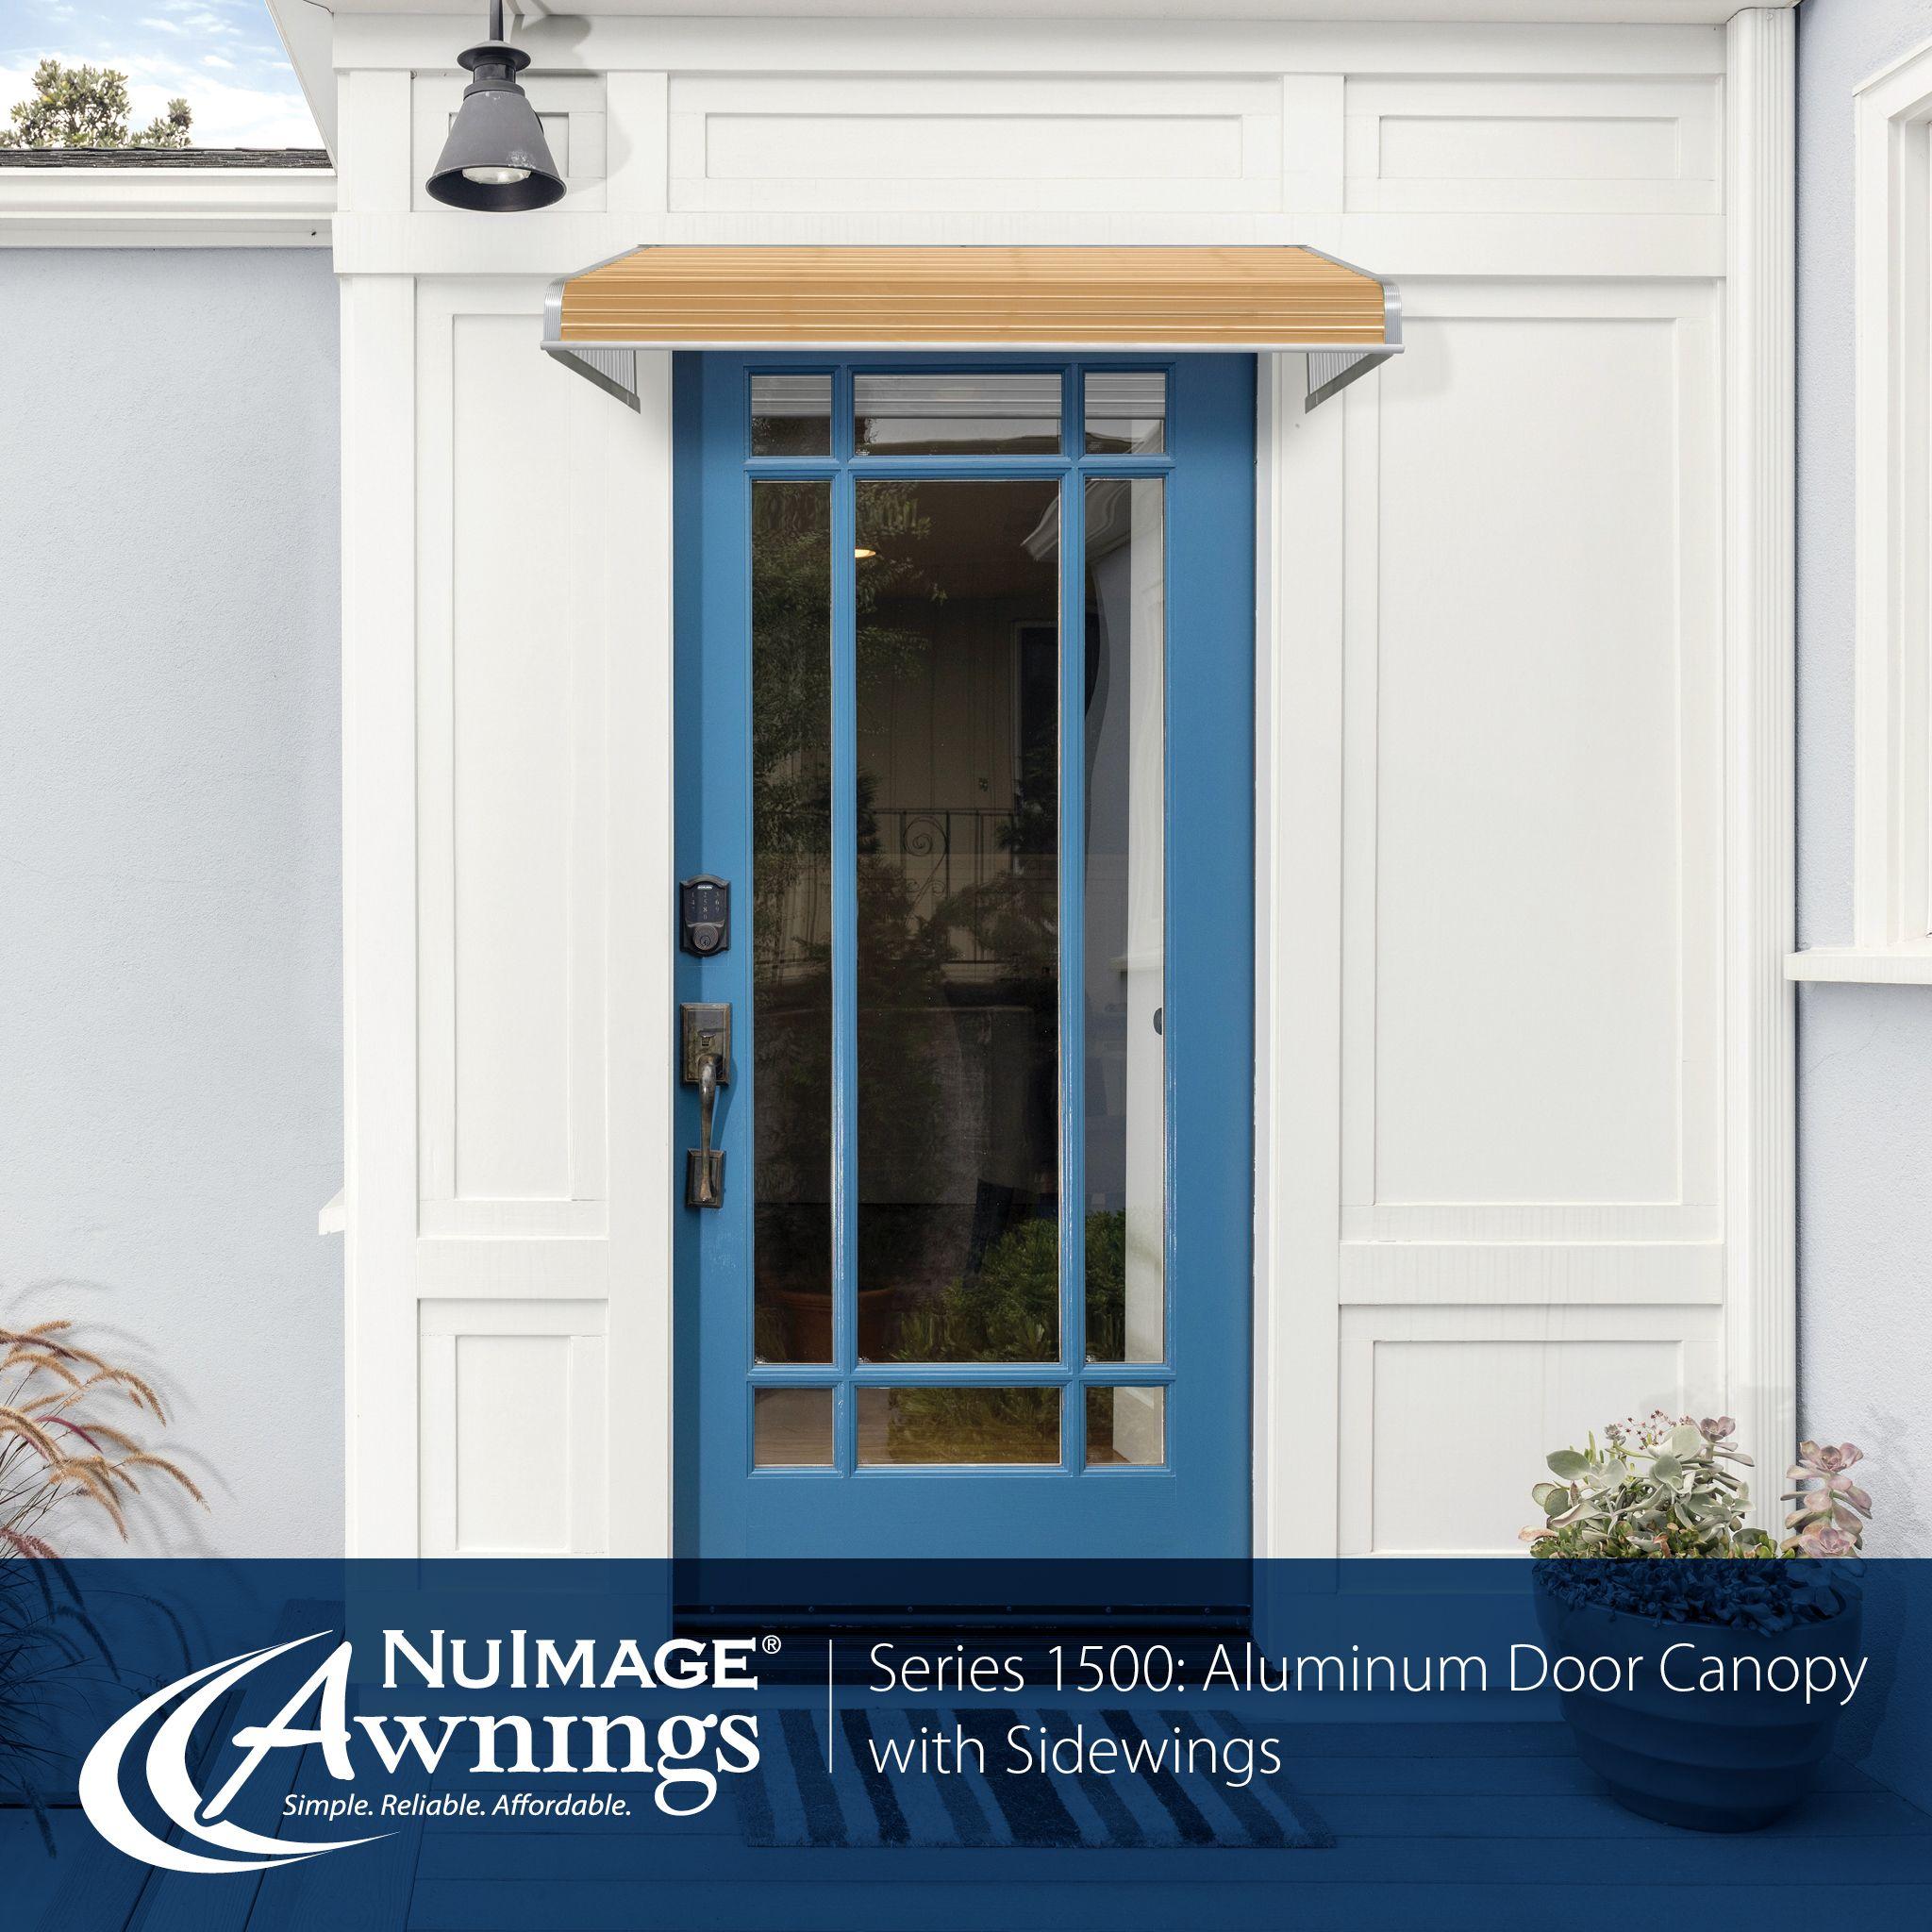 Nuimage Awnings Series 1500 Aluminum Door Canopy Aluminum Awnings Awning Canopy Aluminium Doors